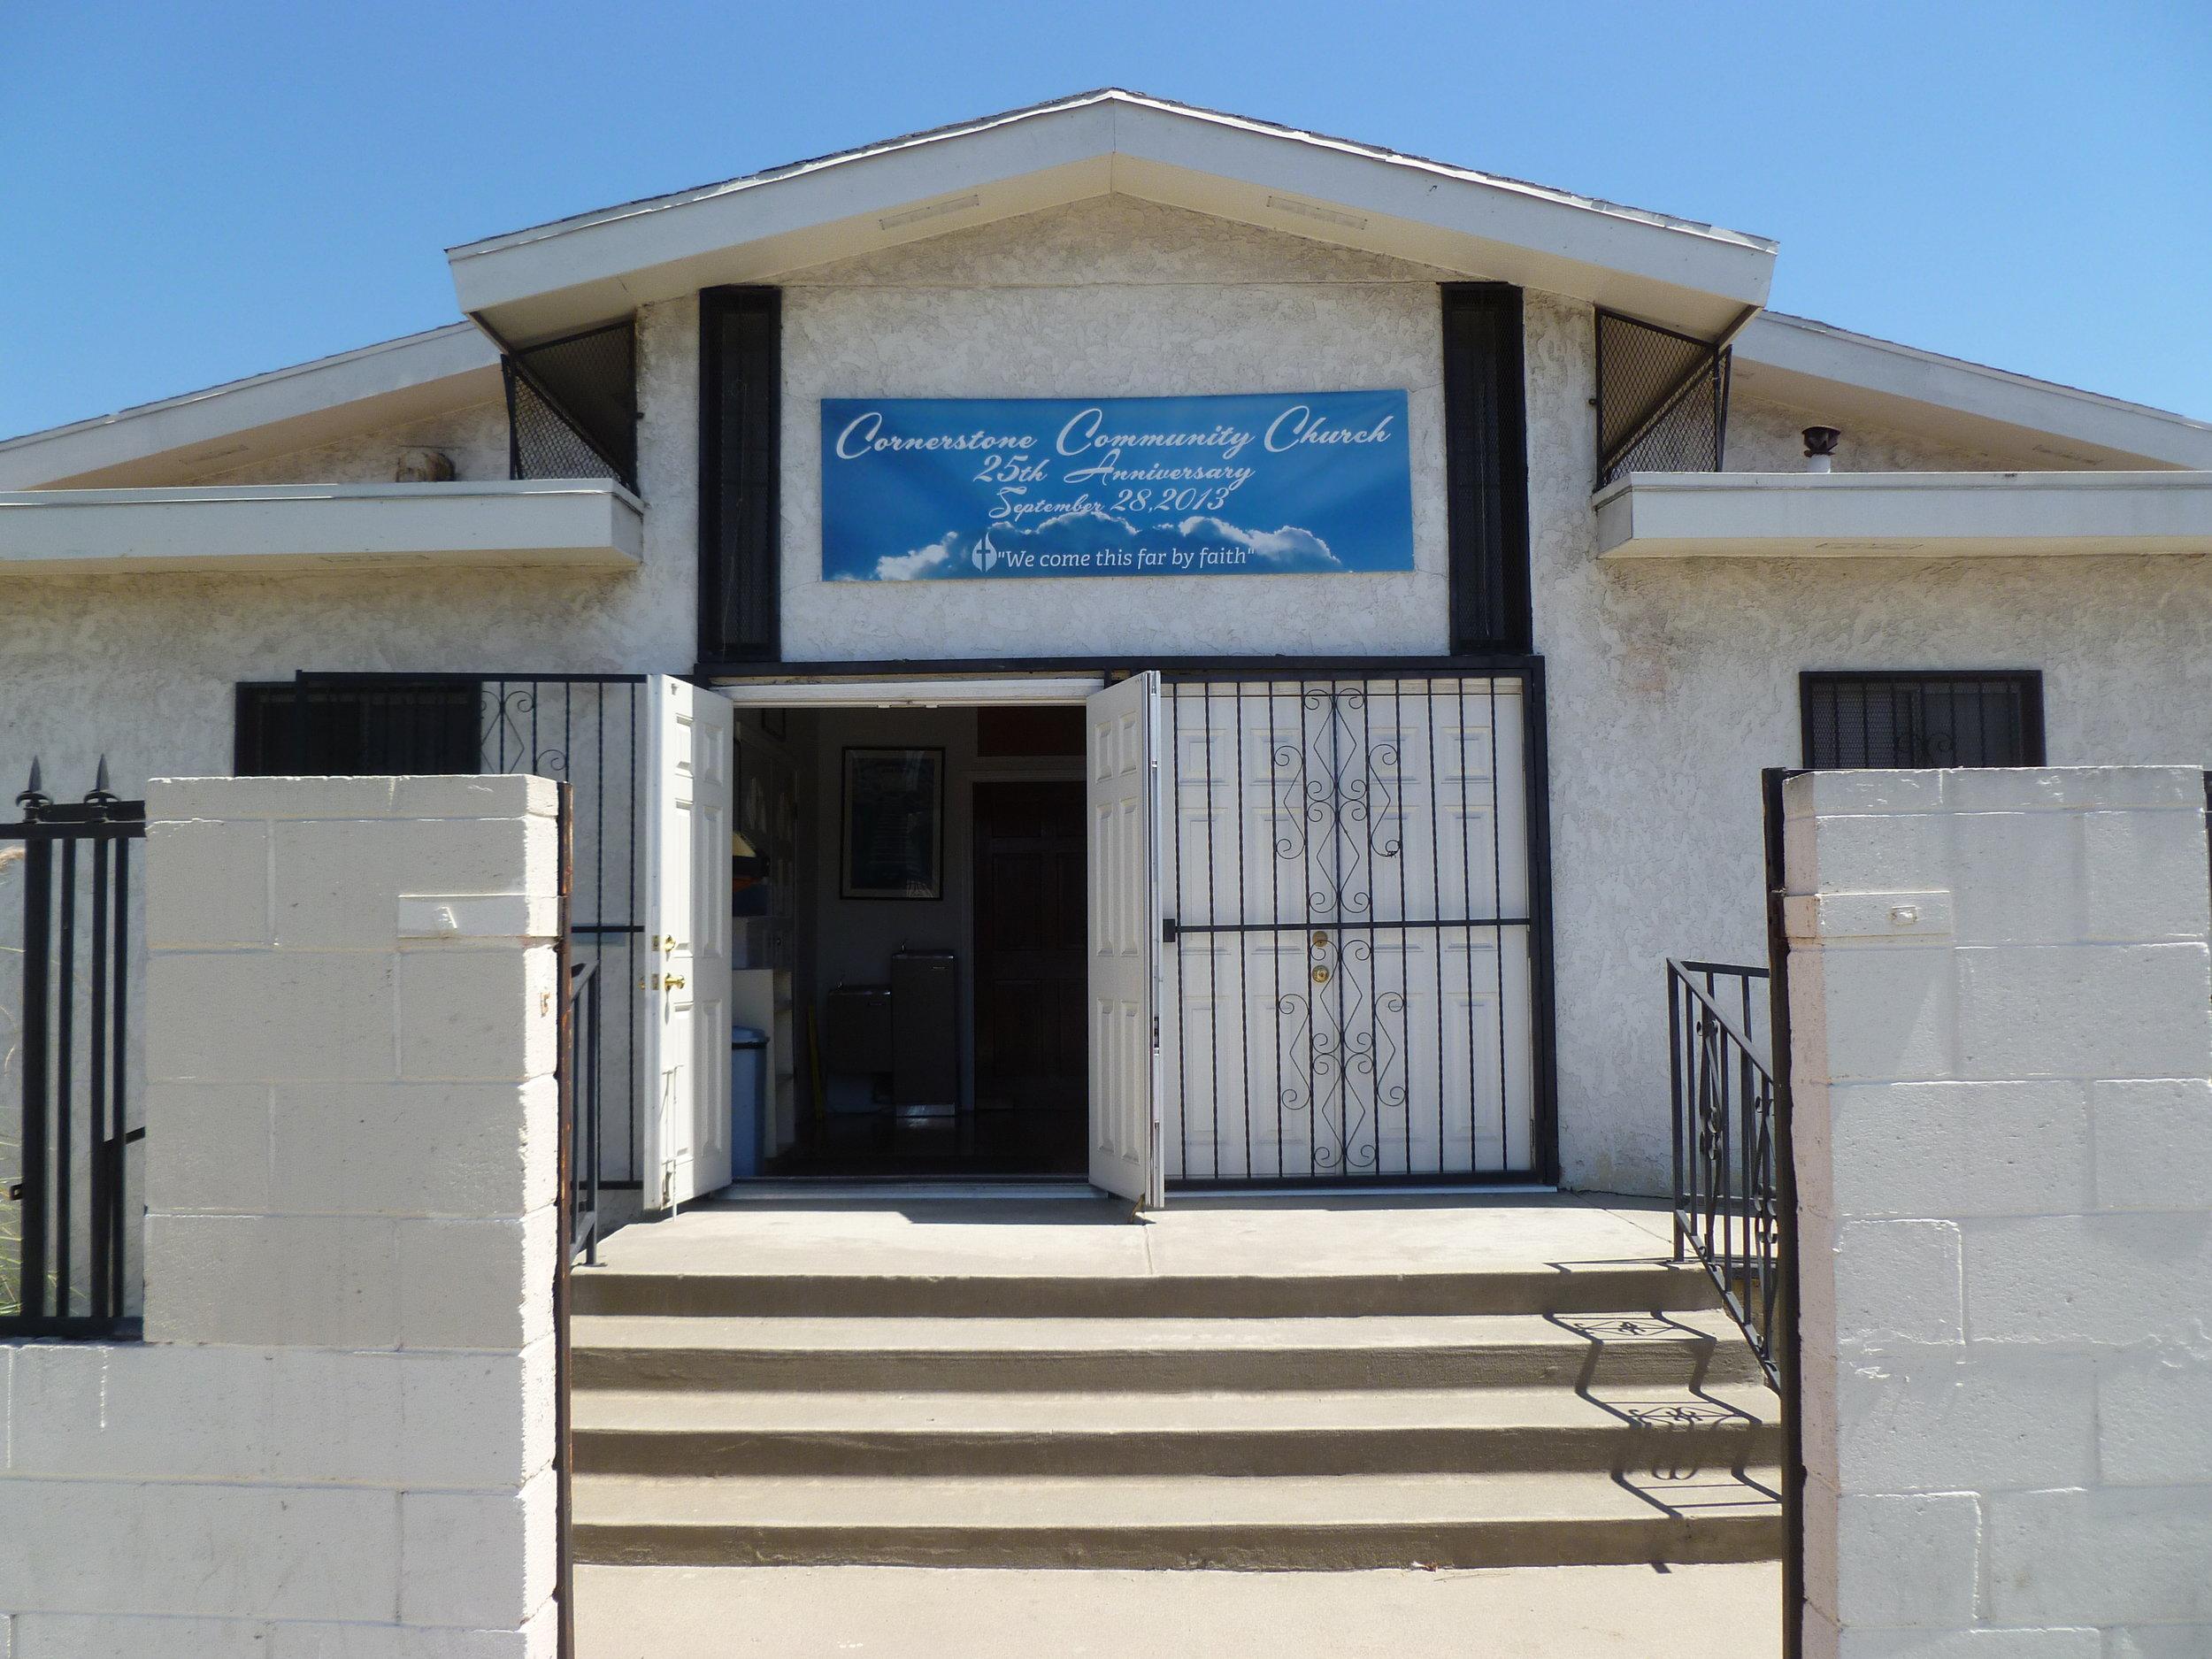 Cornerstone Community Church pre-2016.